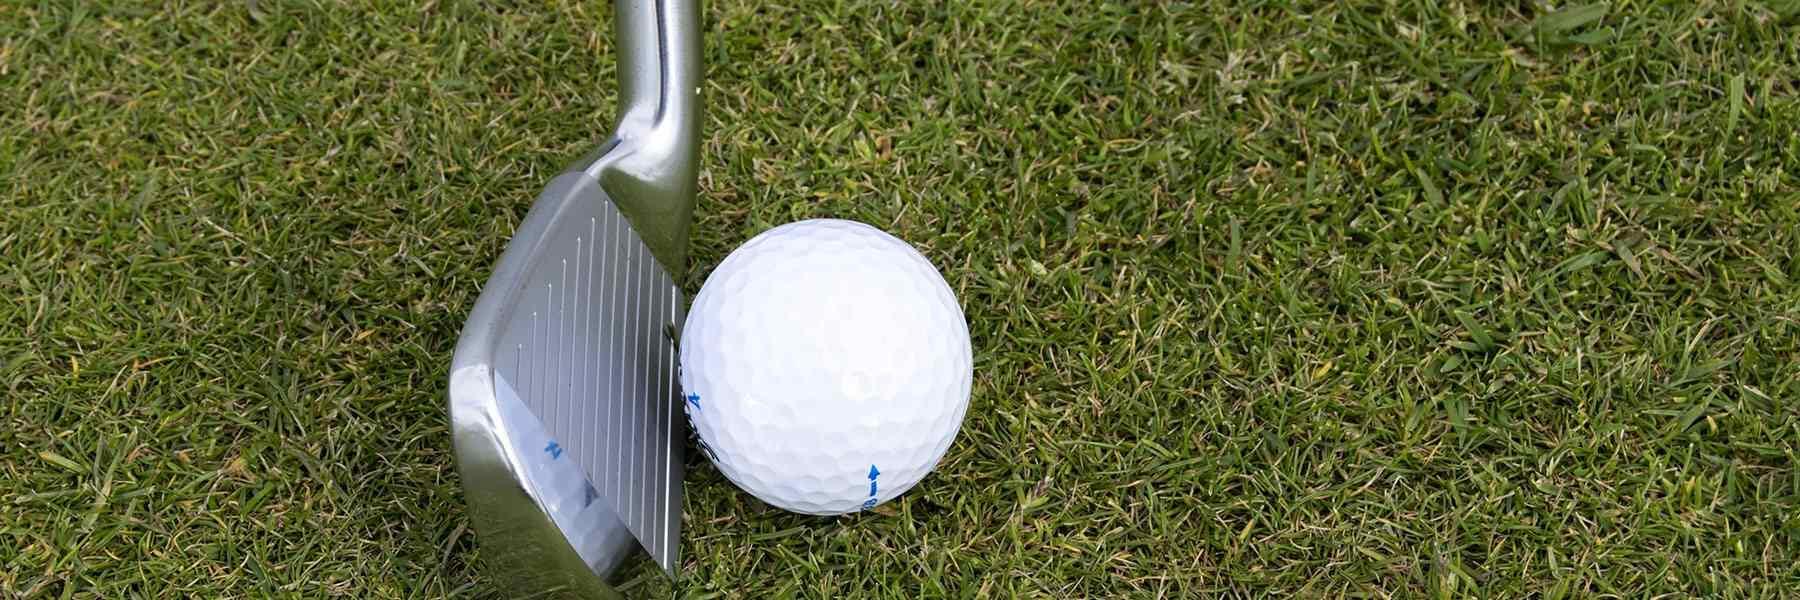 golf managment software